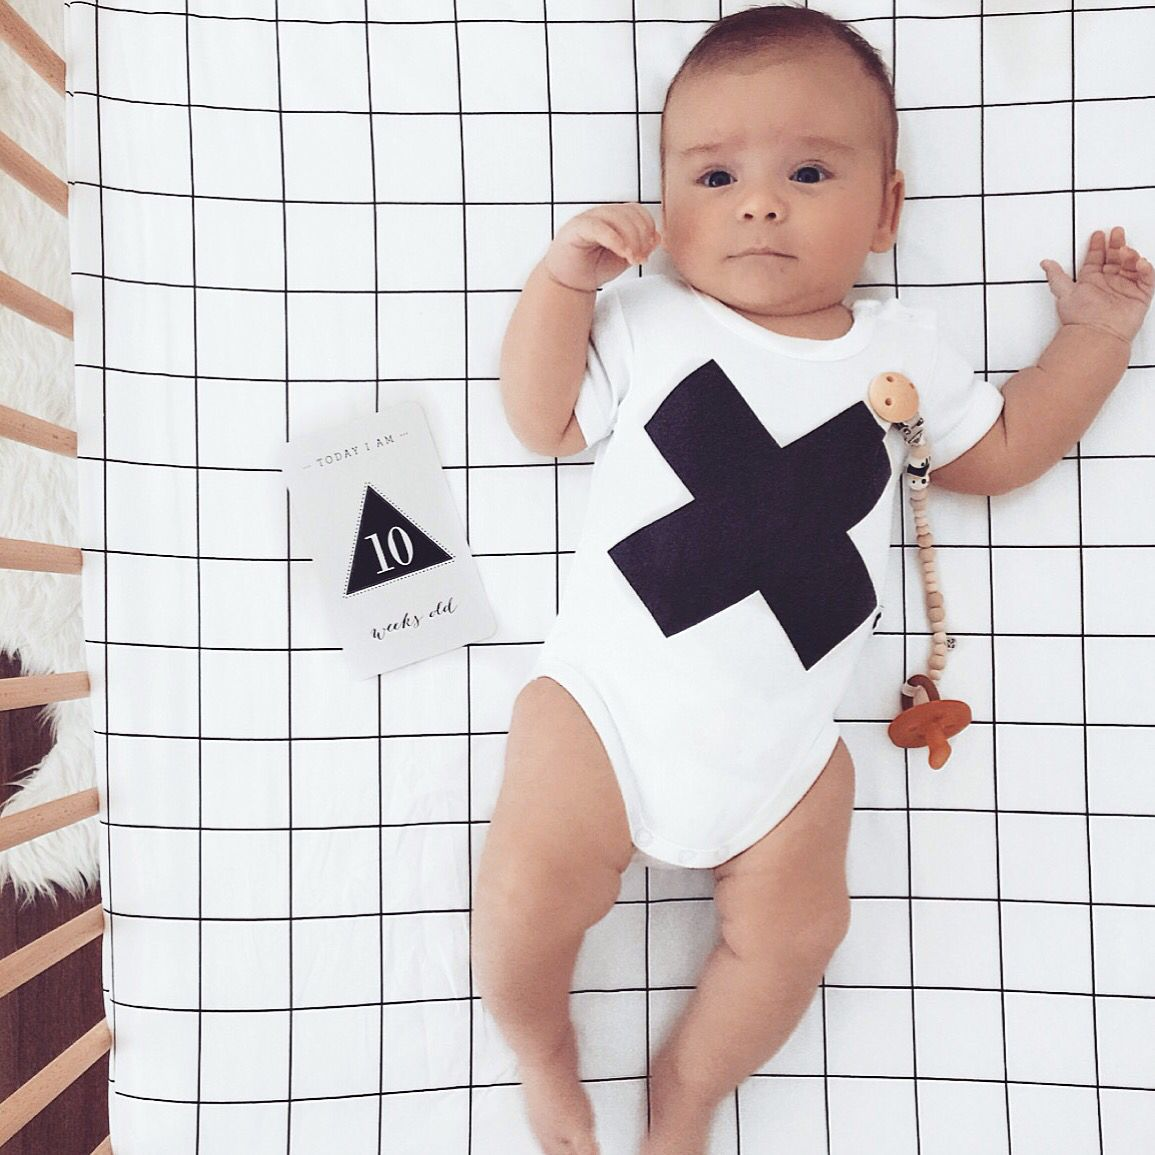 Newborn baby milestones monochrome nursery   @carlyamcdonagh